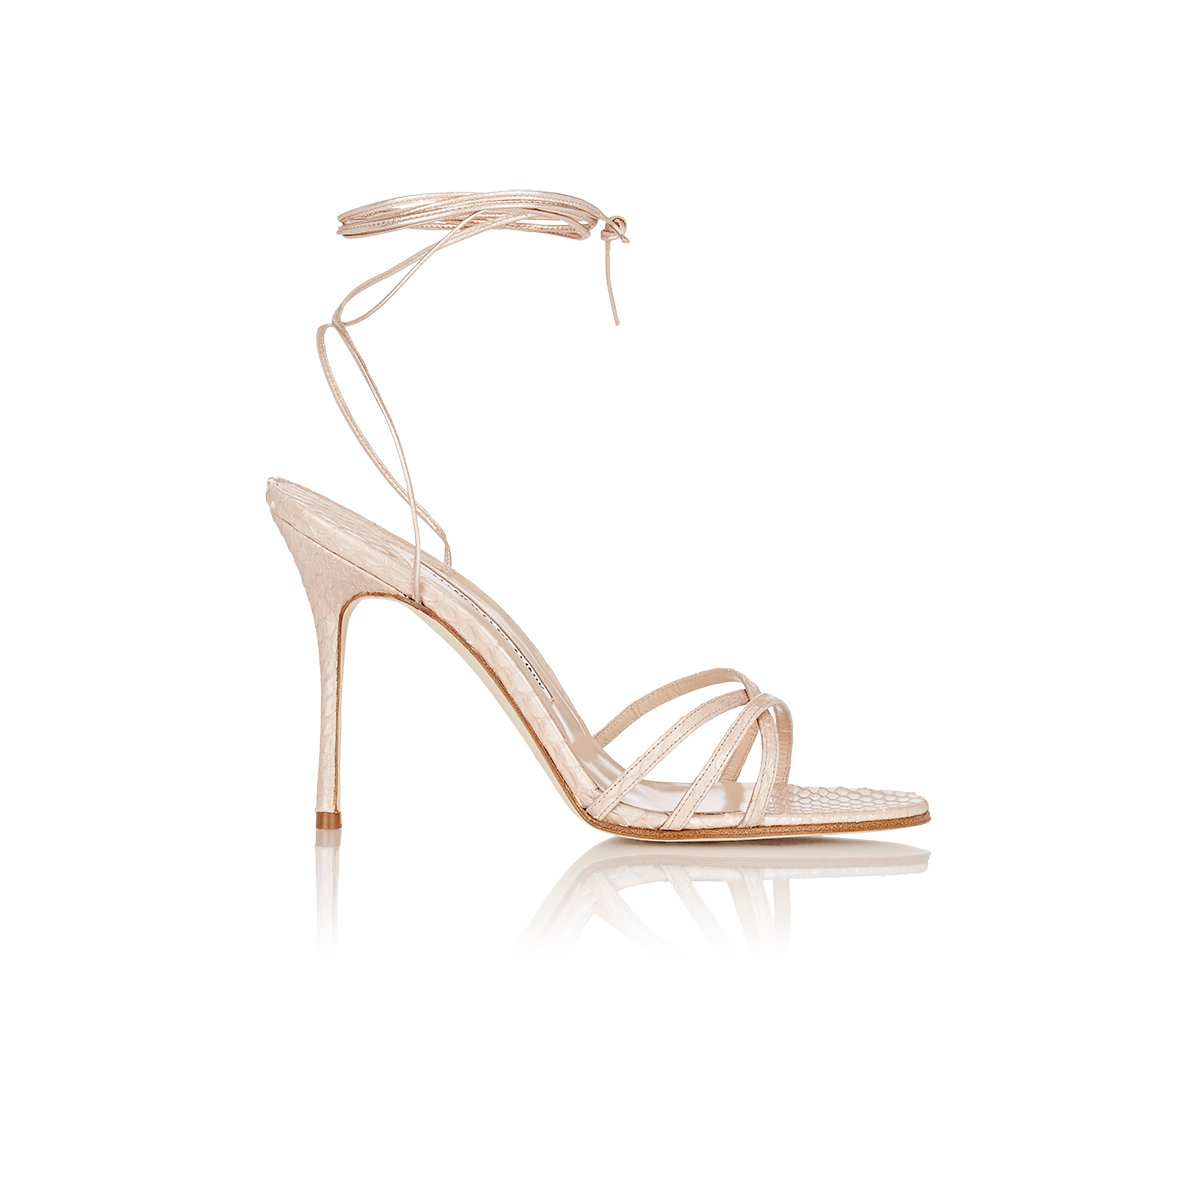 c87f6e9adb Manolo Blahnik Women's Snakeskin Leva Ankle-wrap Sandals in Natural ...